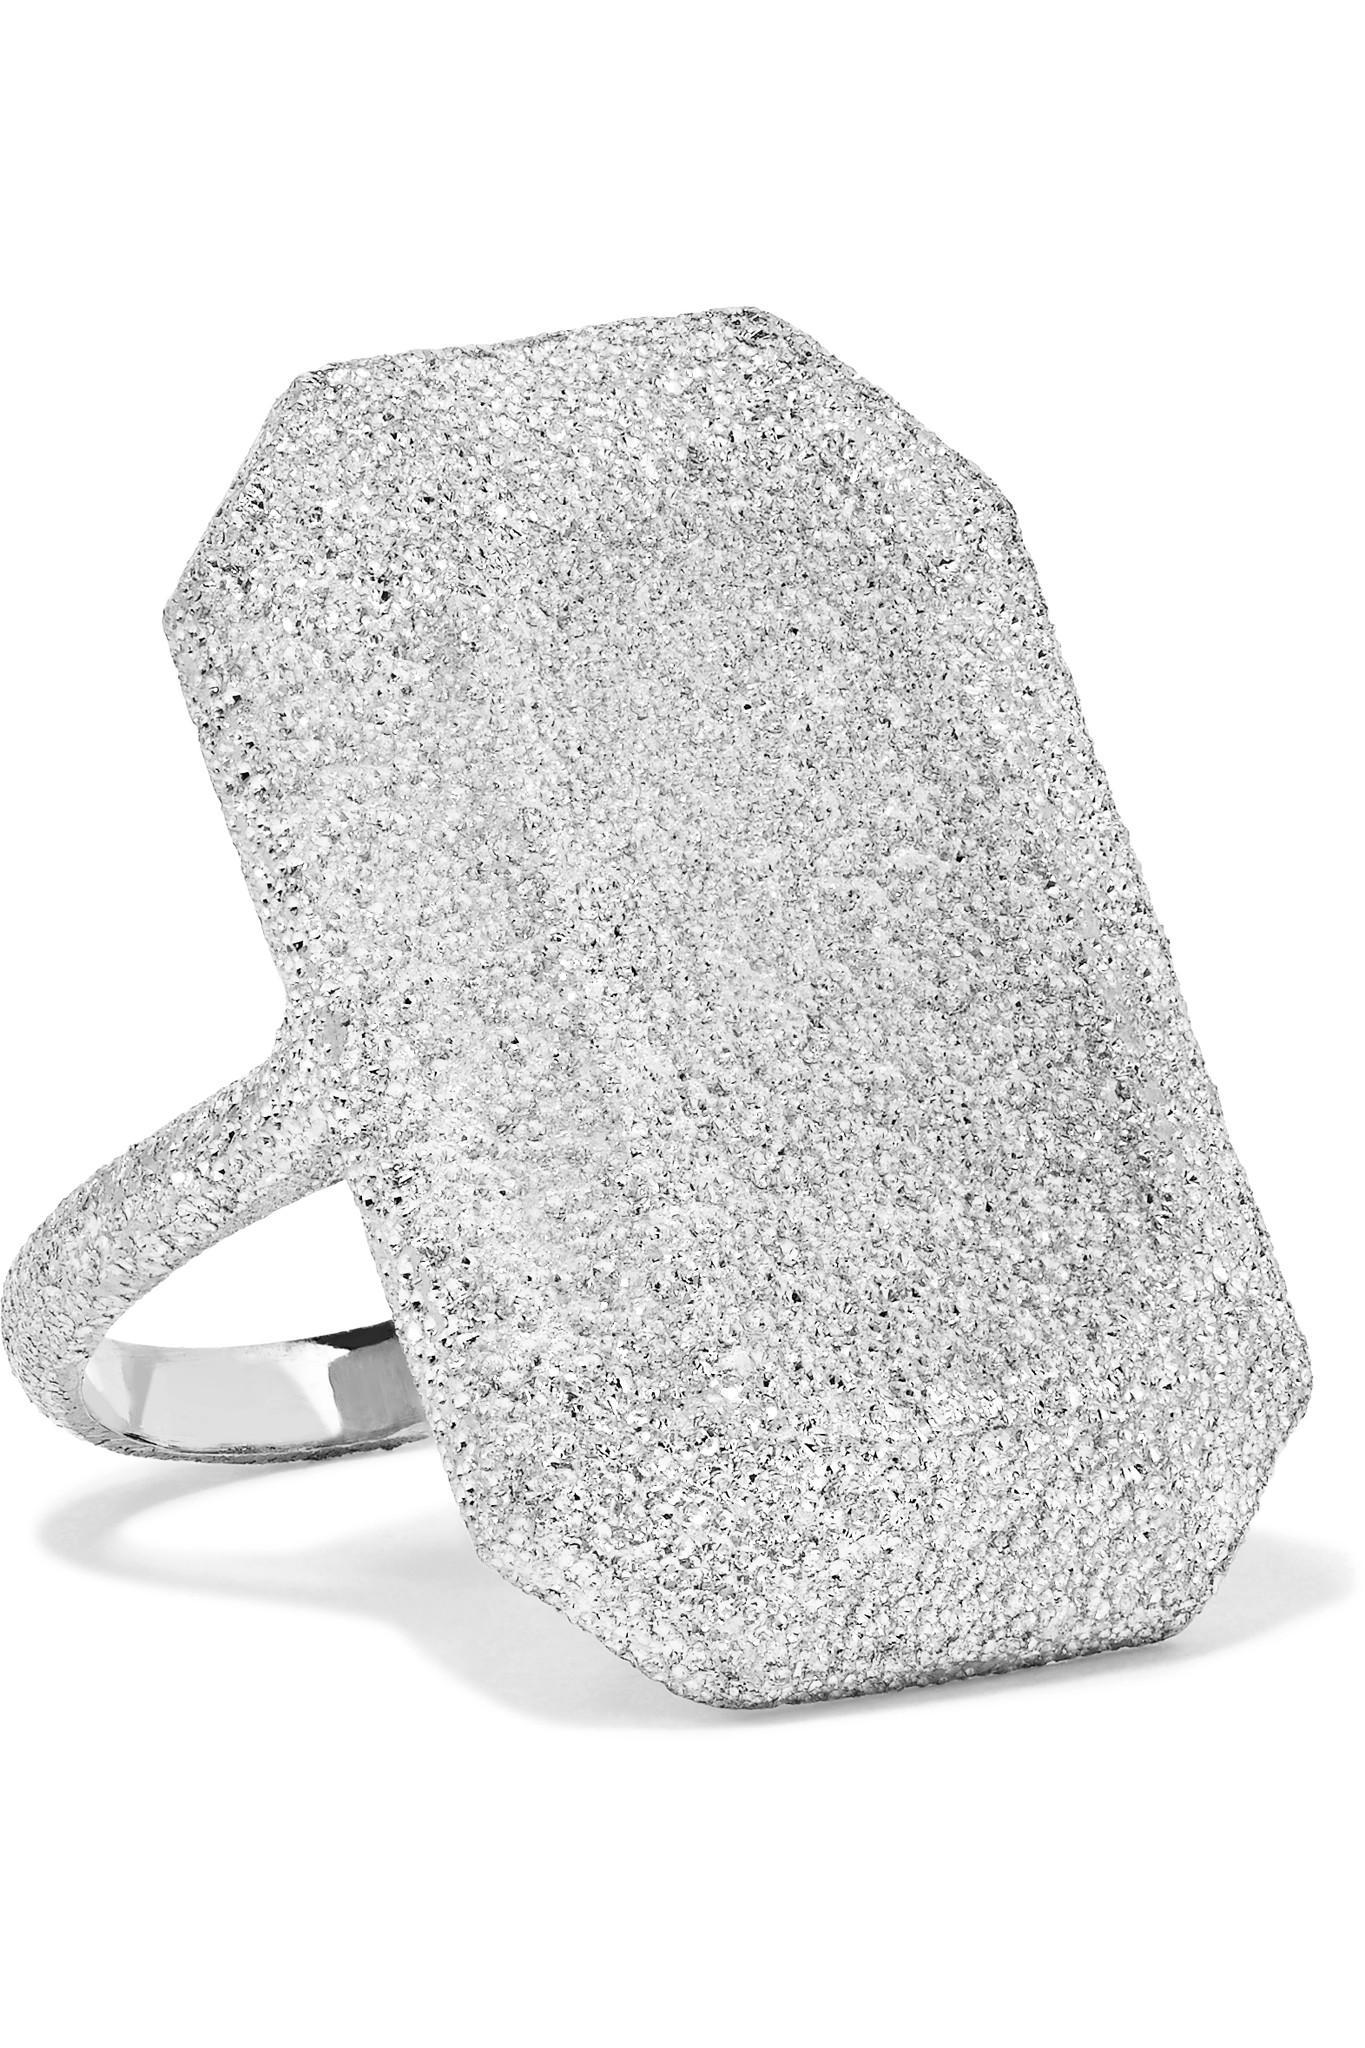 Florentine Heart 18-karat Gold Ring - 7 Carolina Bucci IoKrgND